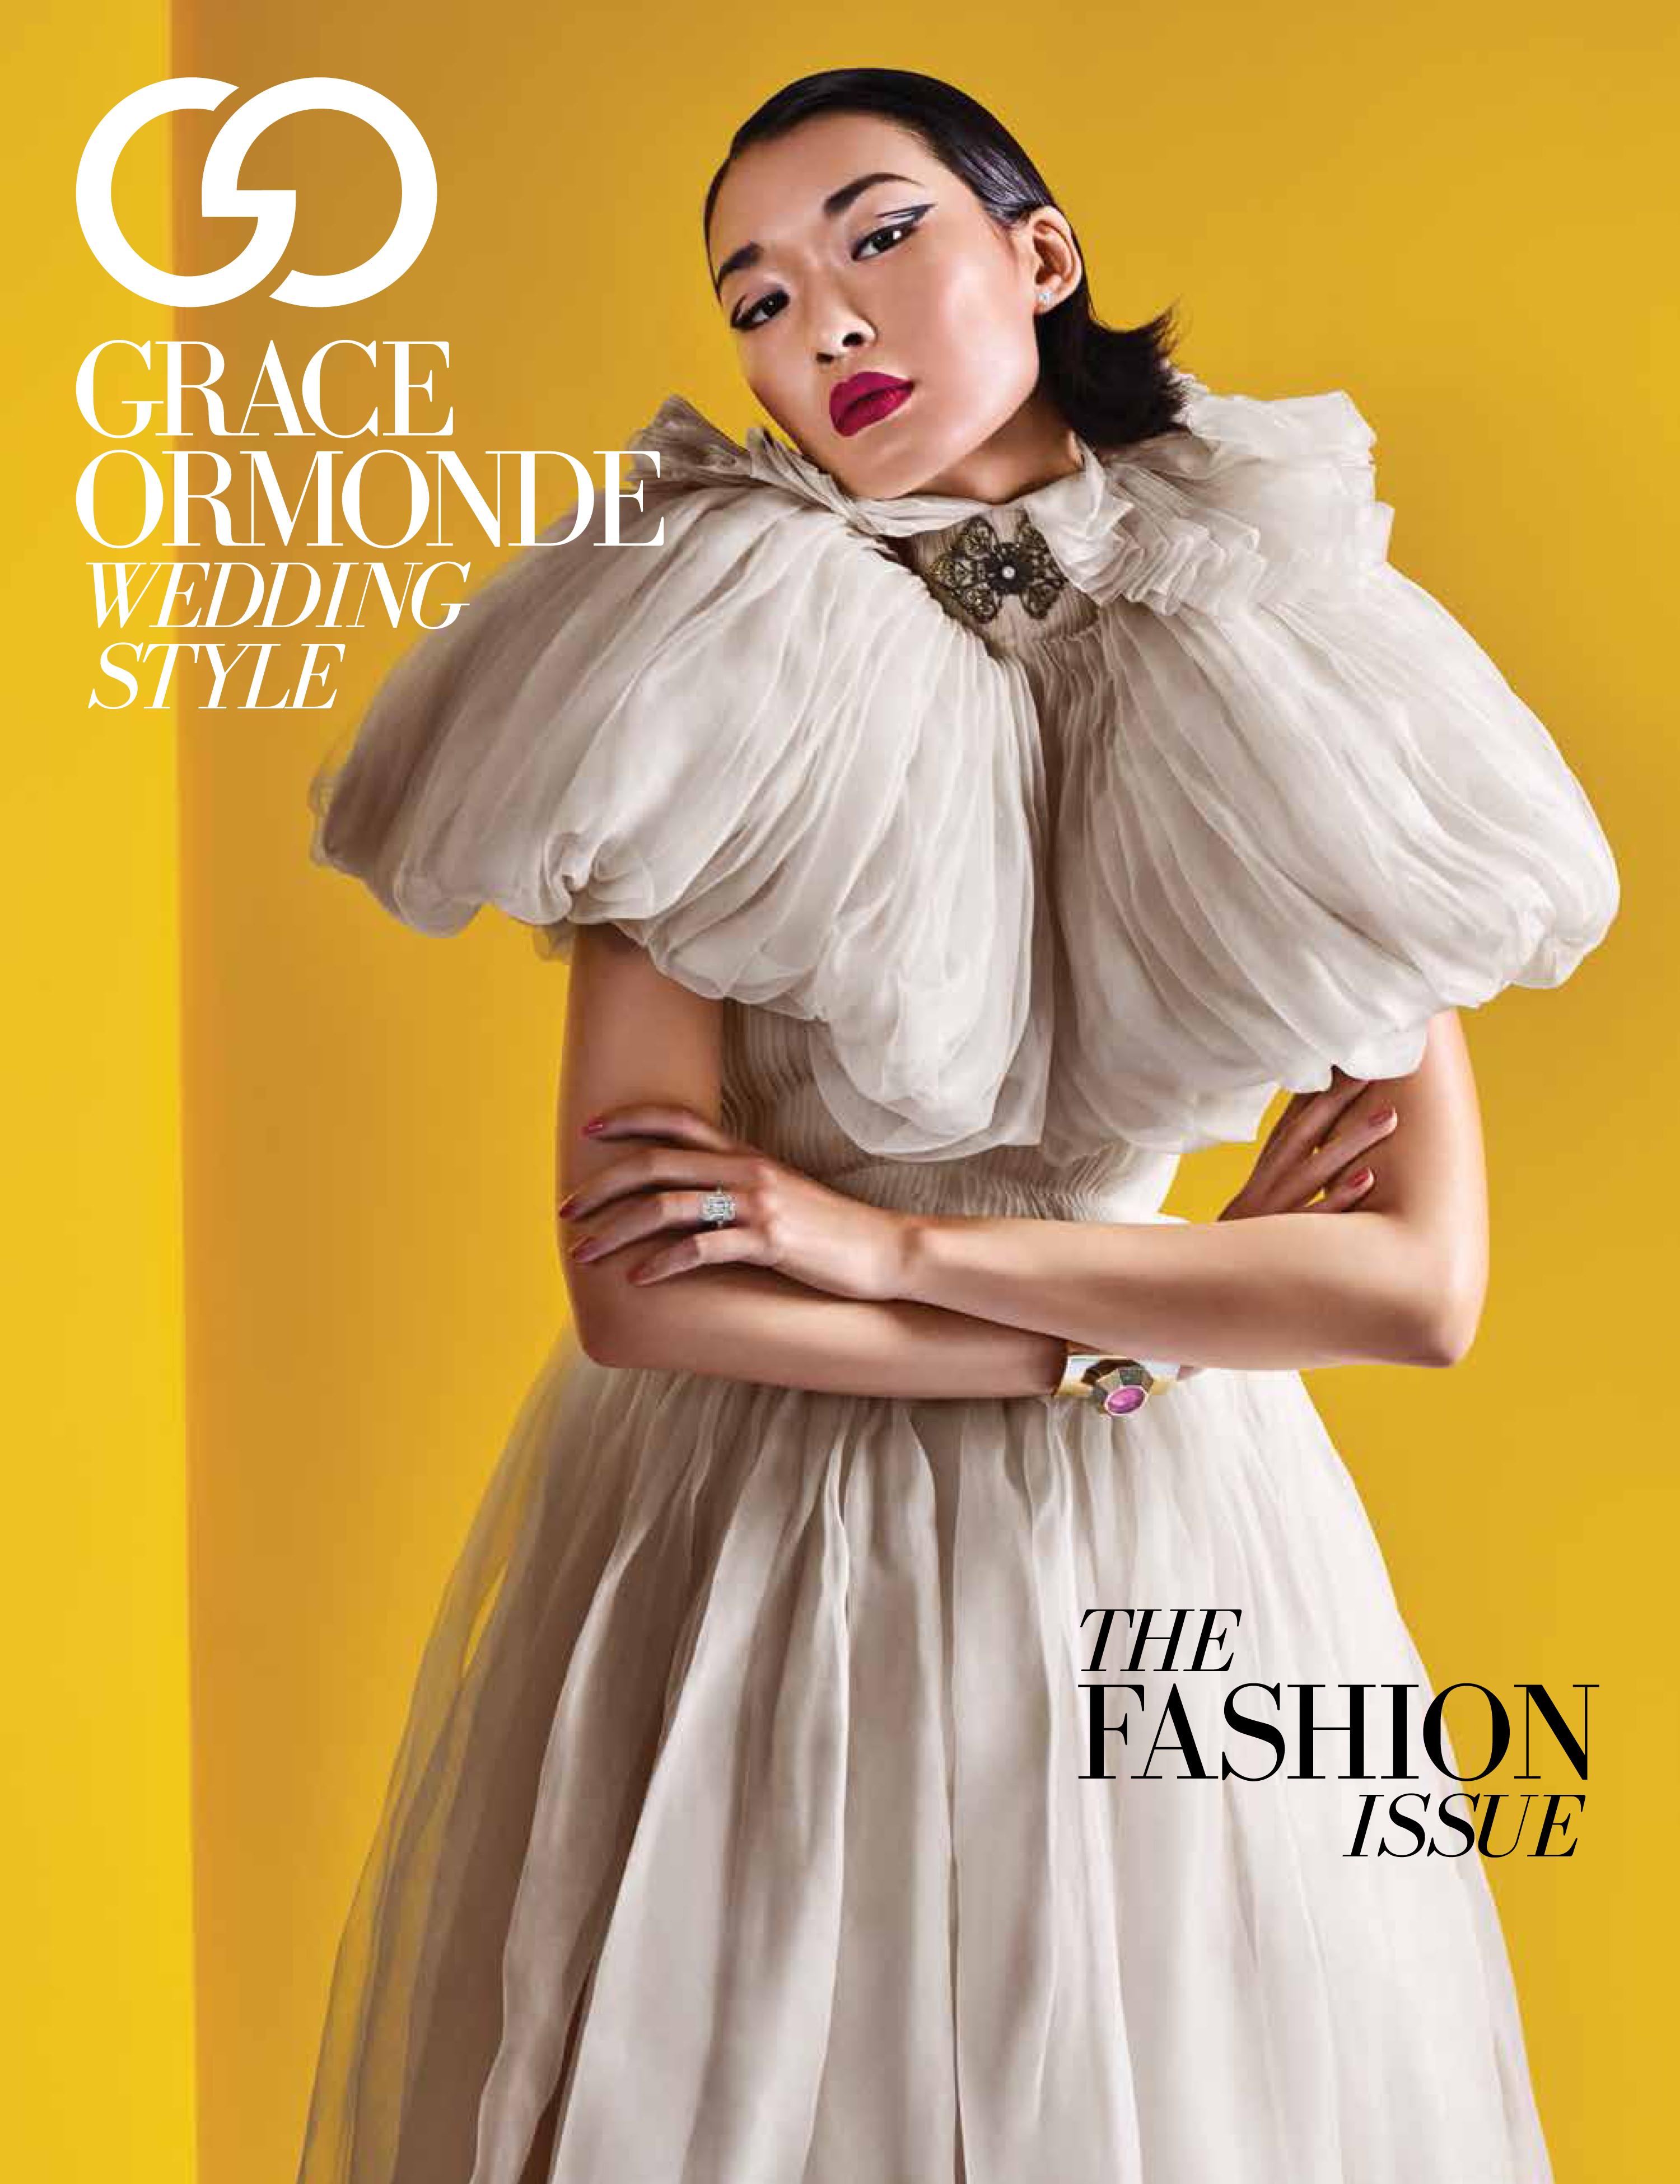 Grace Ormonde Magazine